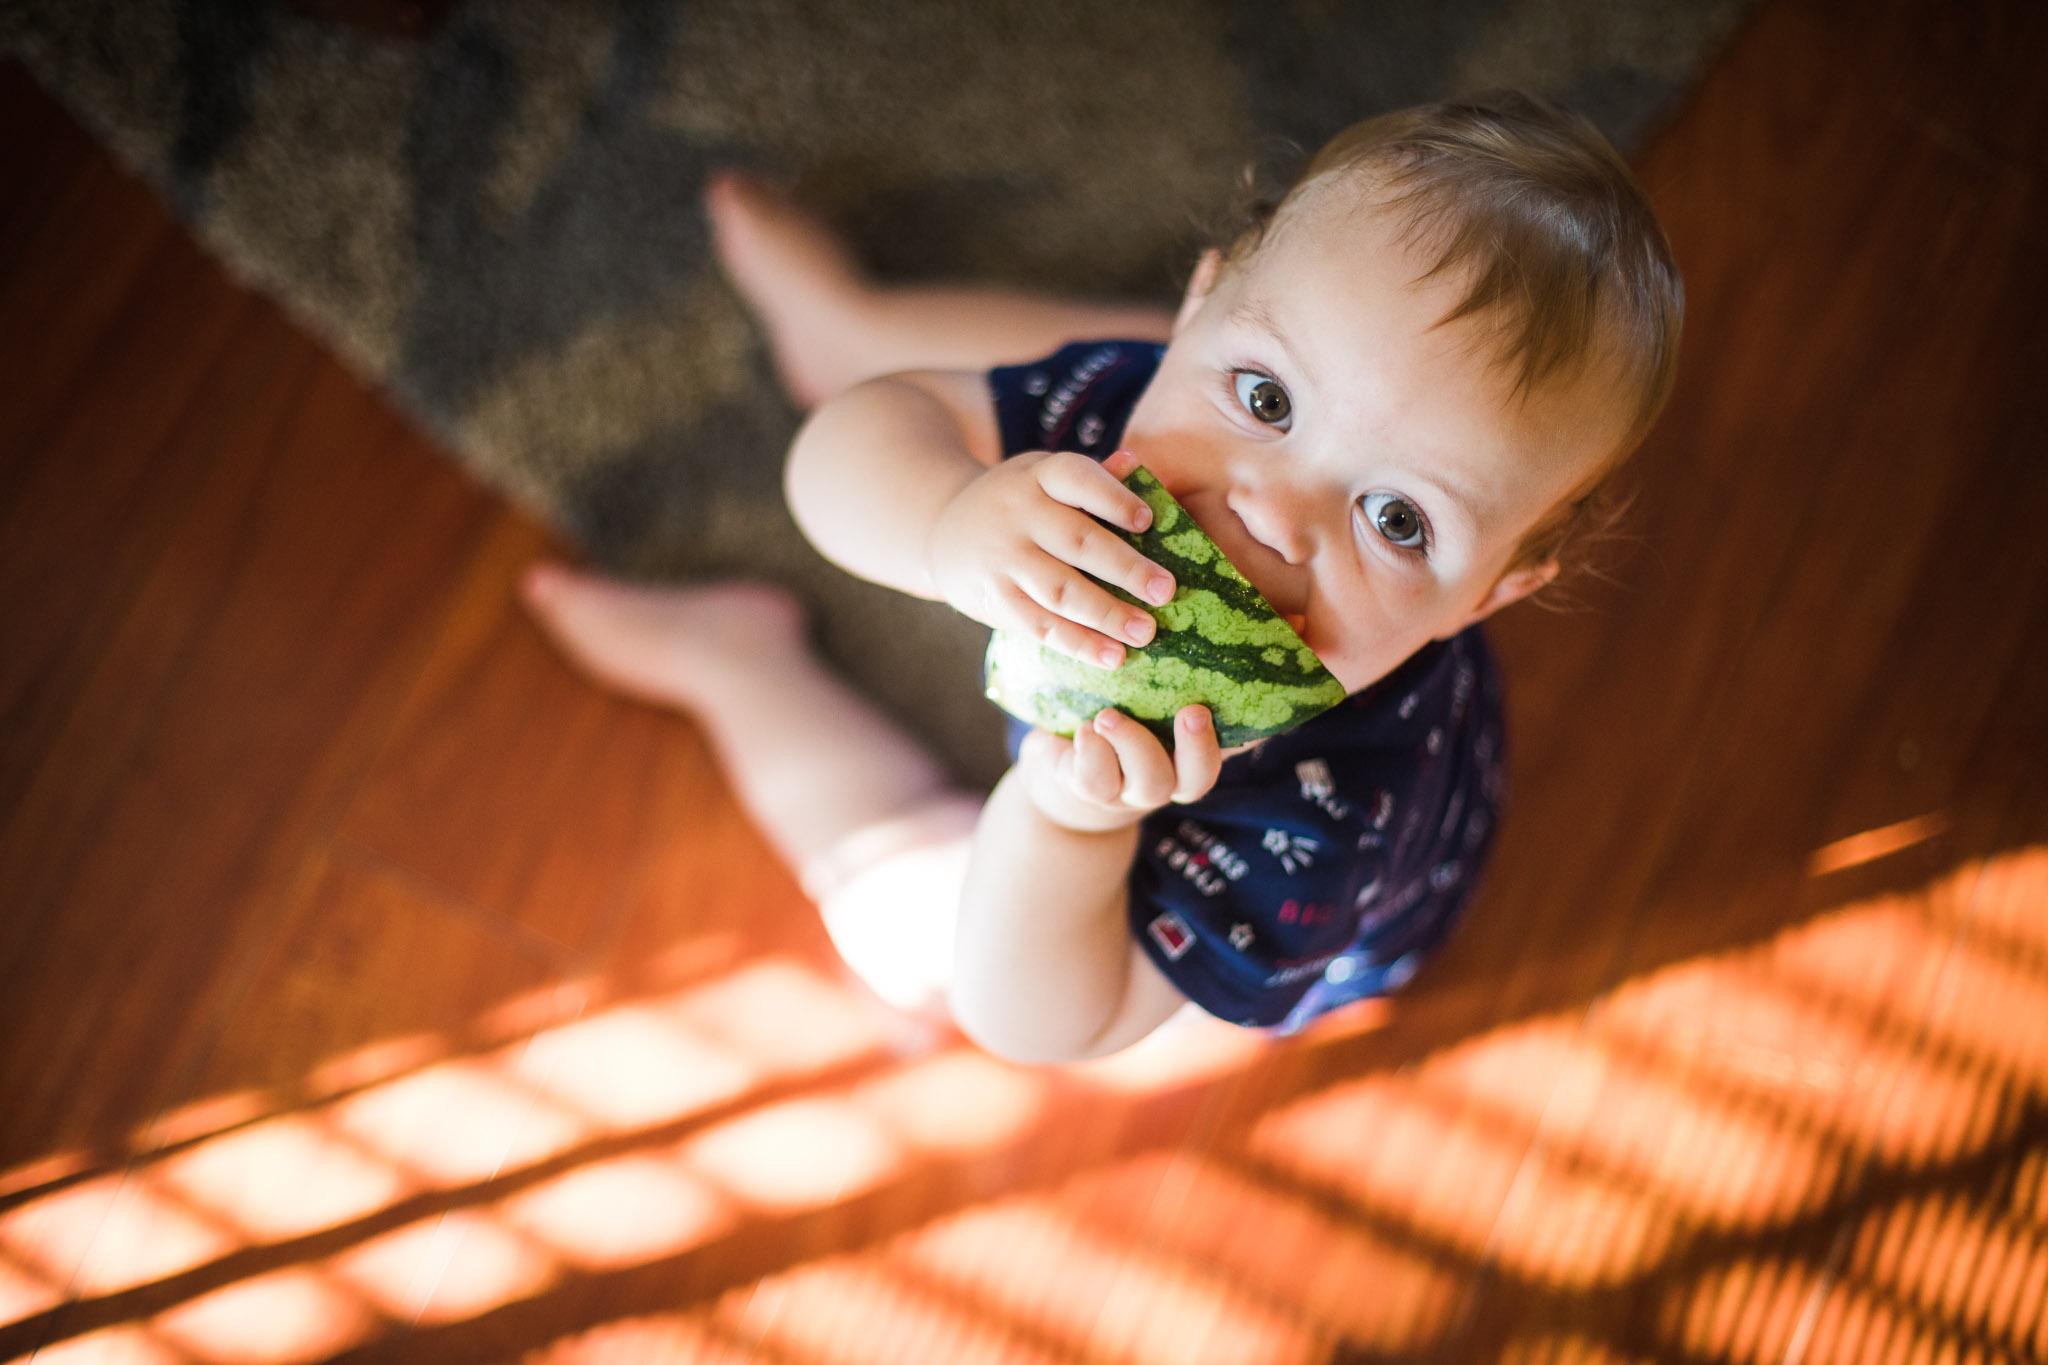 Archer_Inspired_Photography_Watermelon_Baby_Boy_Eating_Lifestyle_Photographer_California-8.jpg